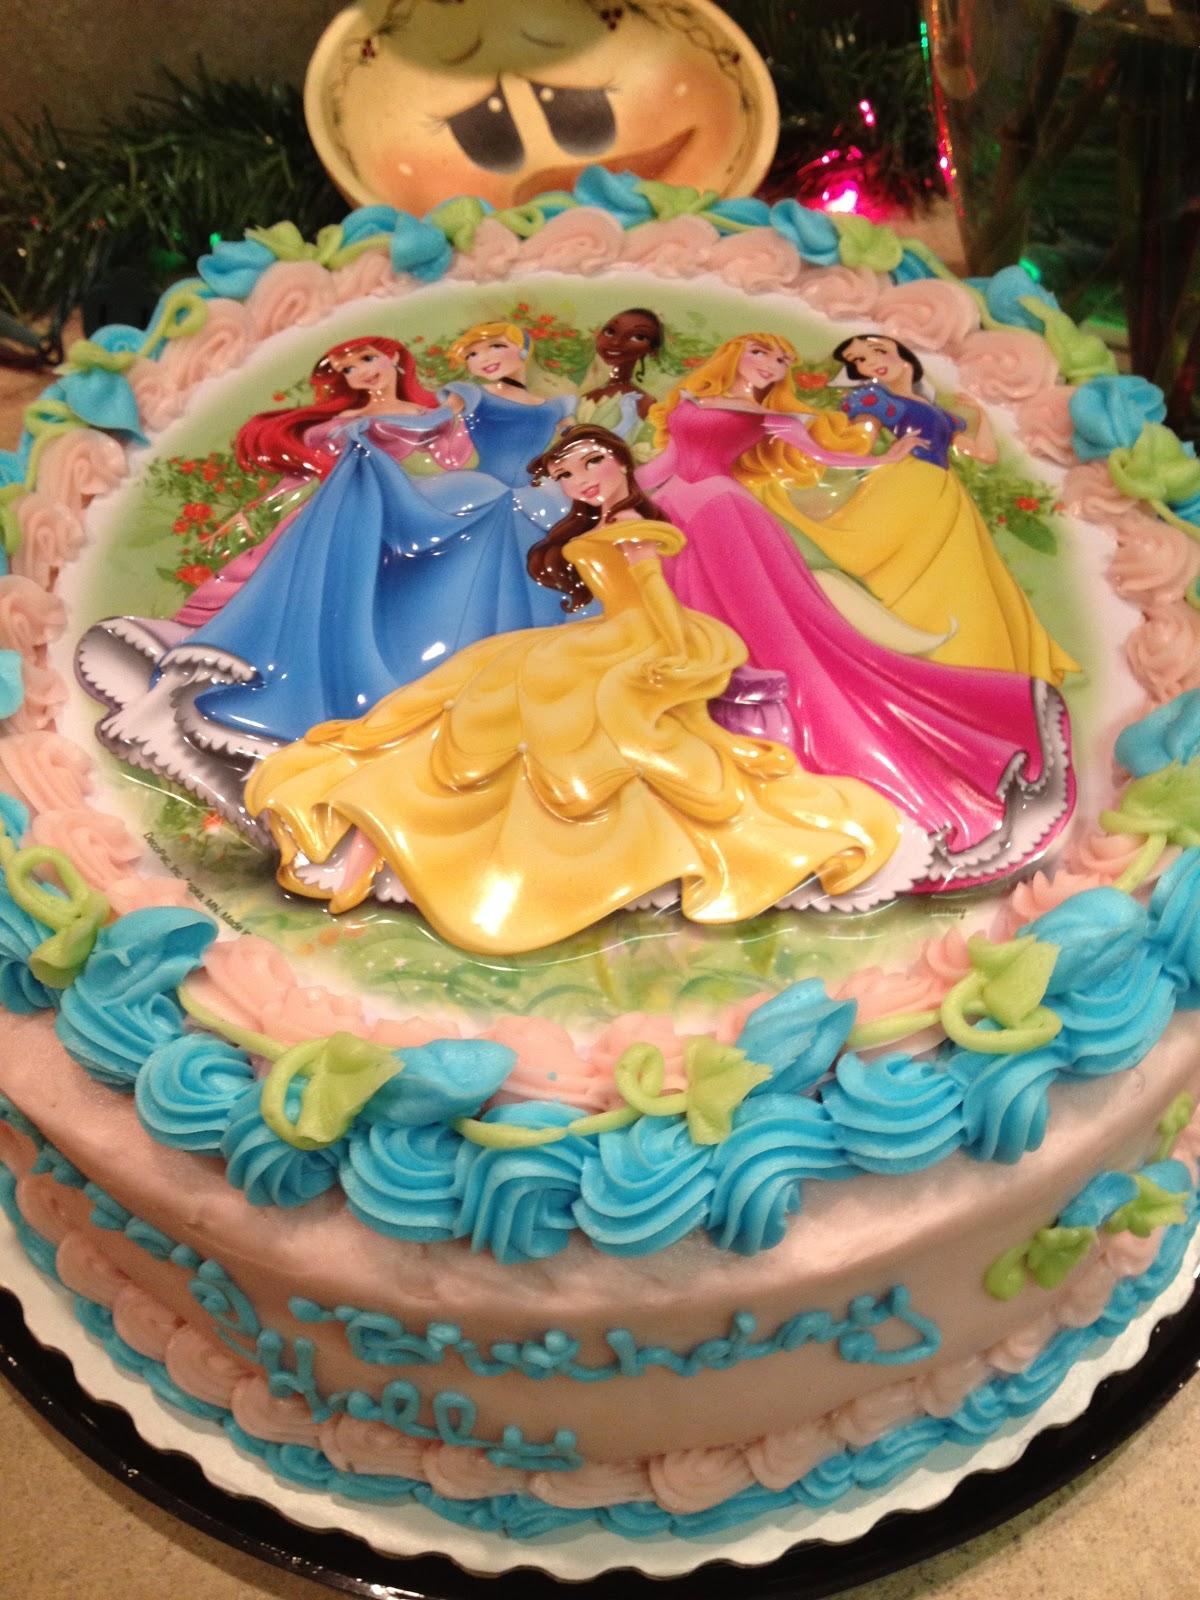 Cake Designs Sam S Club : Sams Club Birthday Cake Ideas and Designs